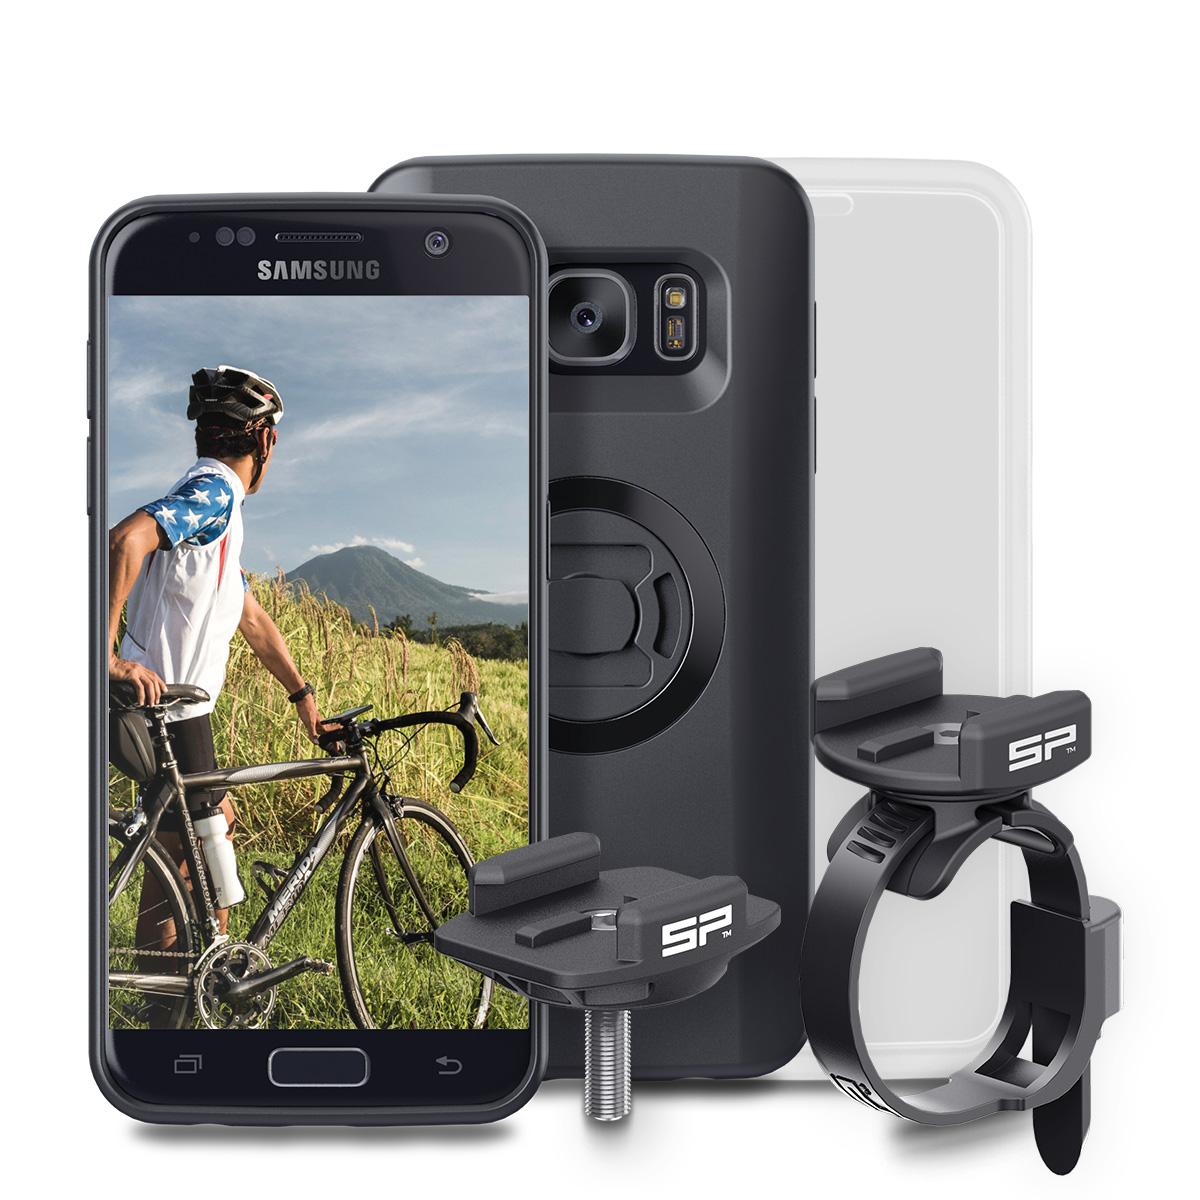 SP Connect Bike Bundle Samsung S7